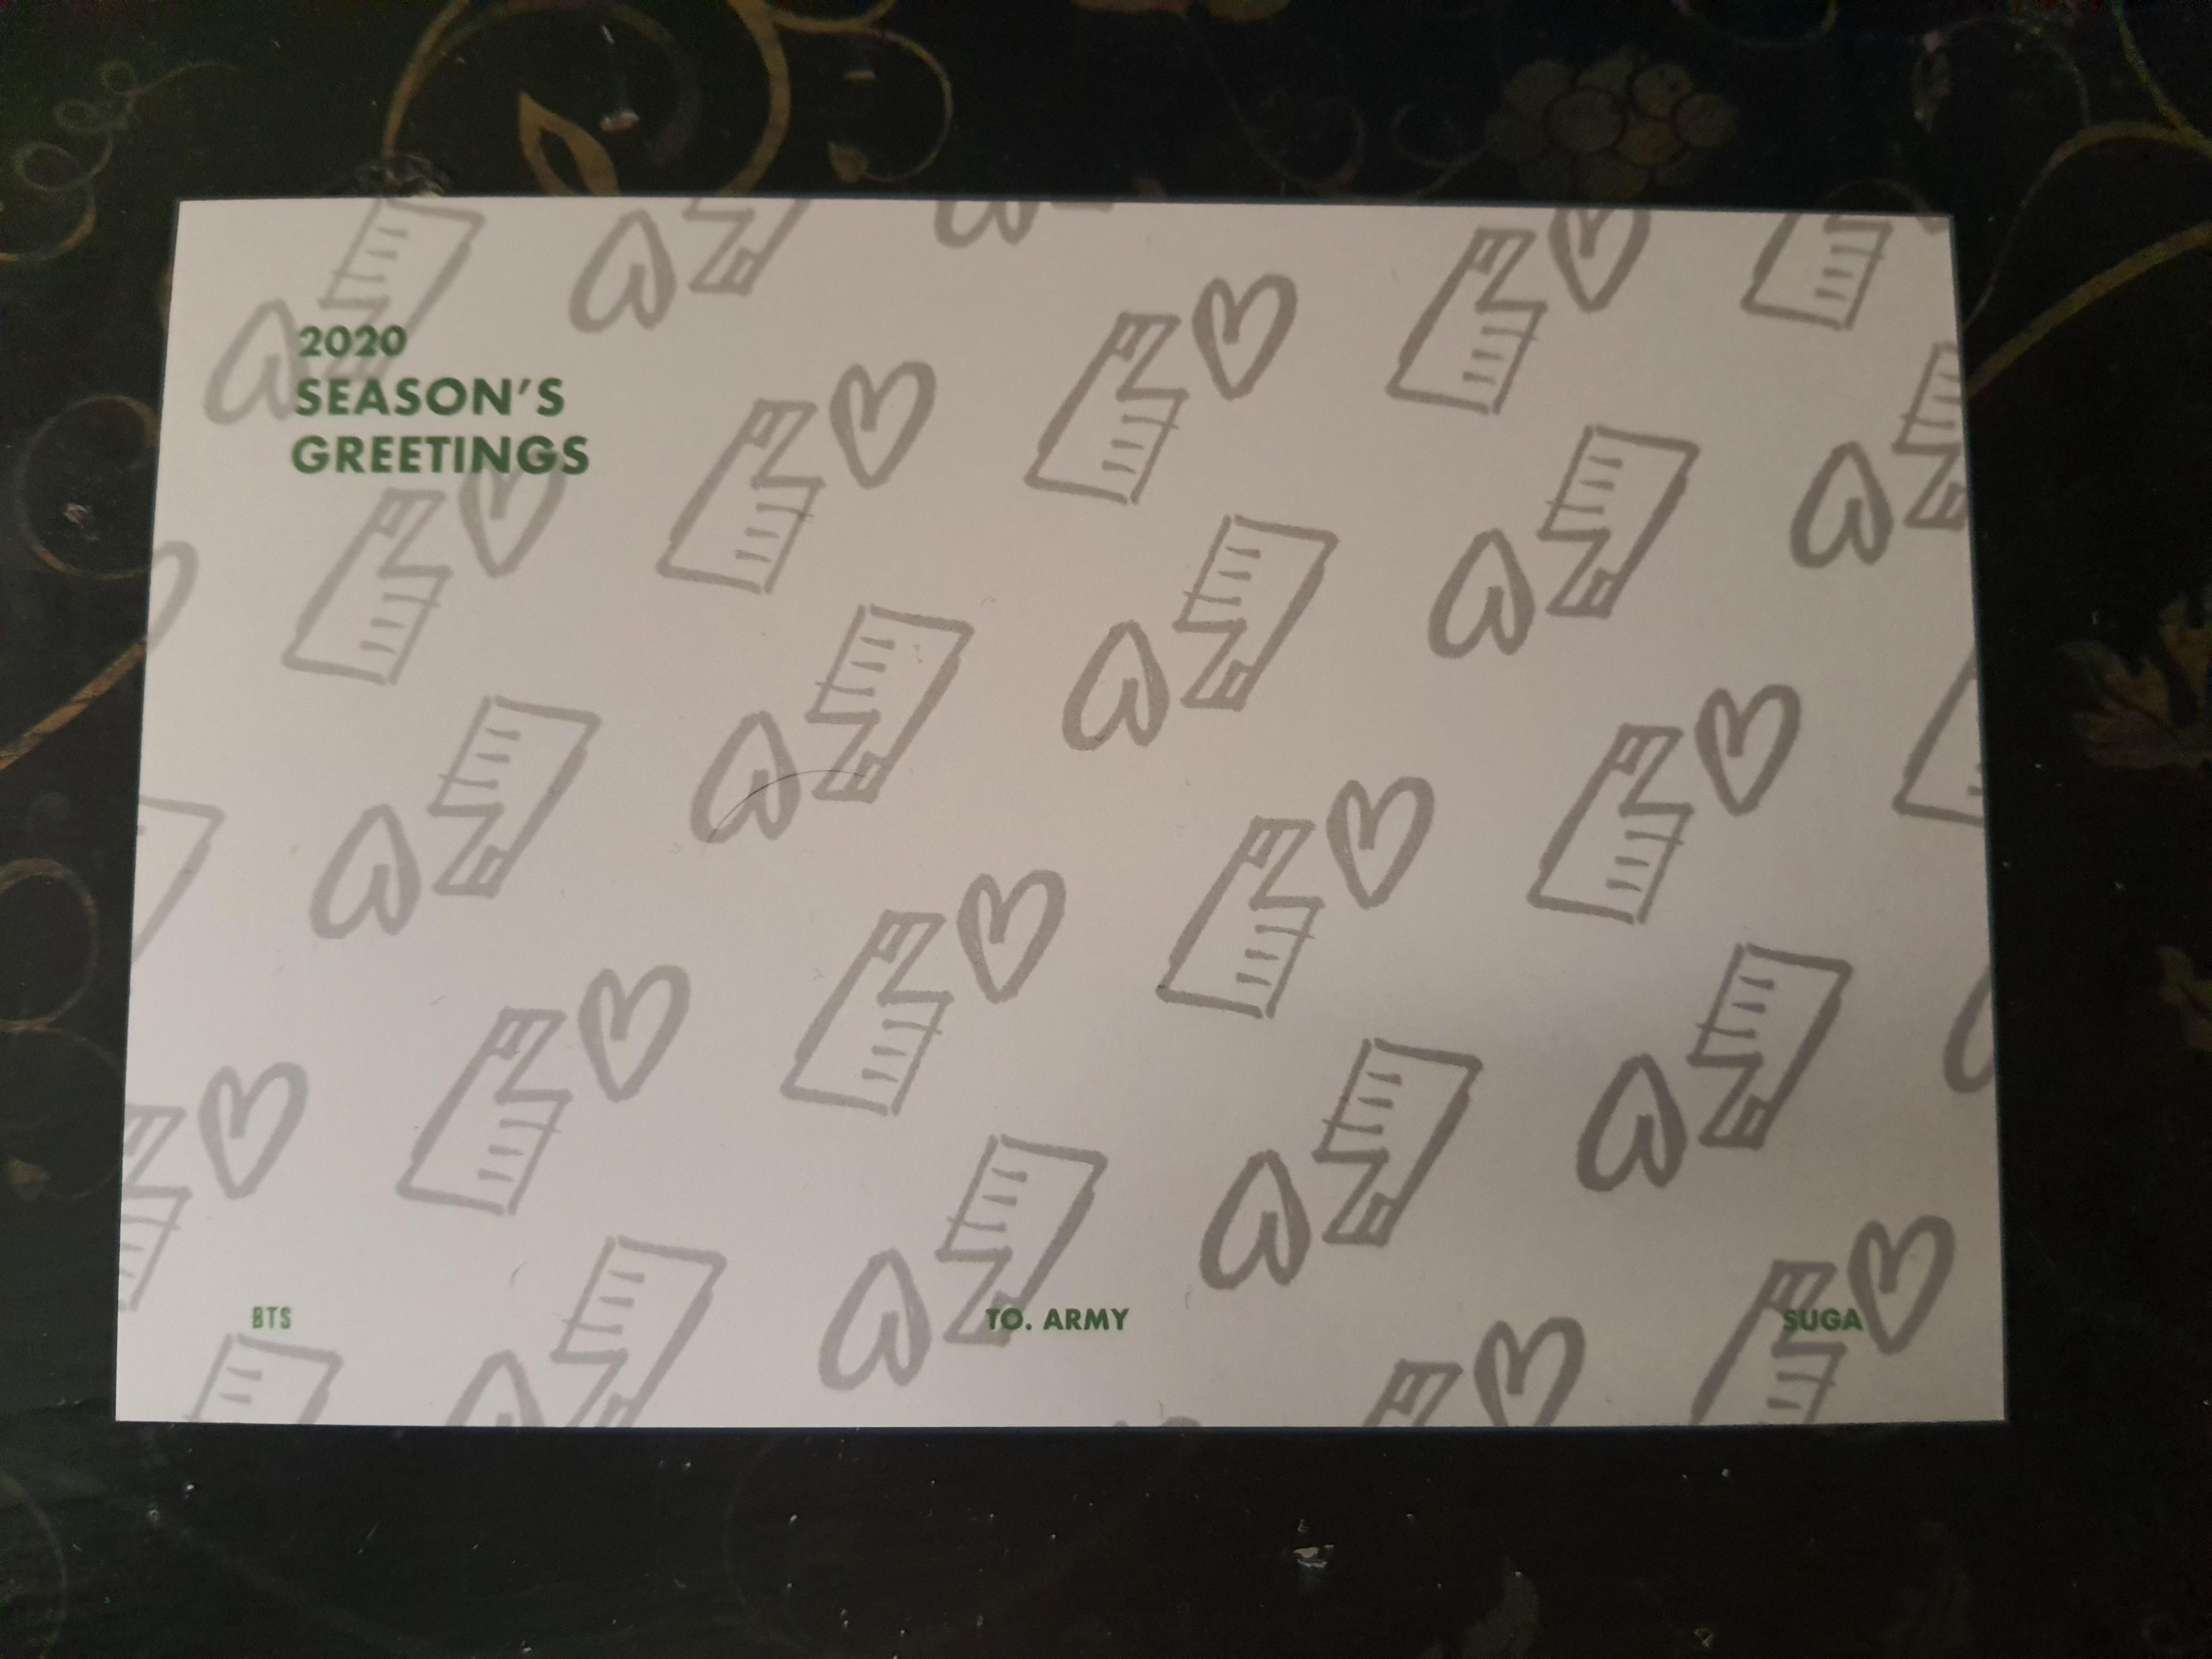 BTS 2020 SEASON'S GREETING SUGA MESSAGE GREETING CARD